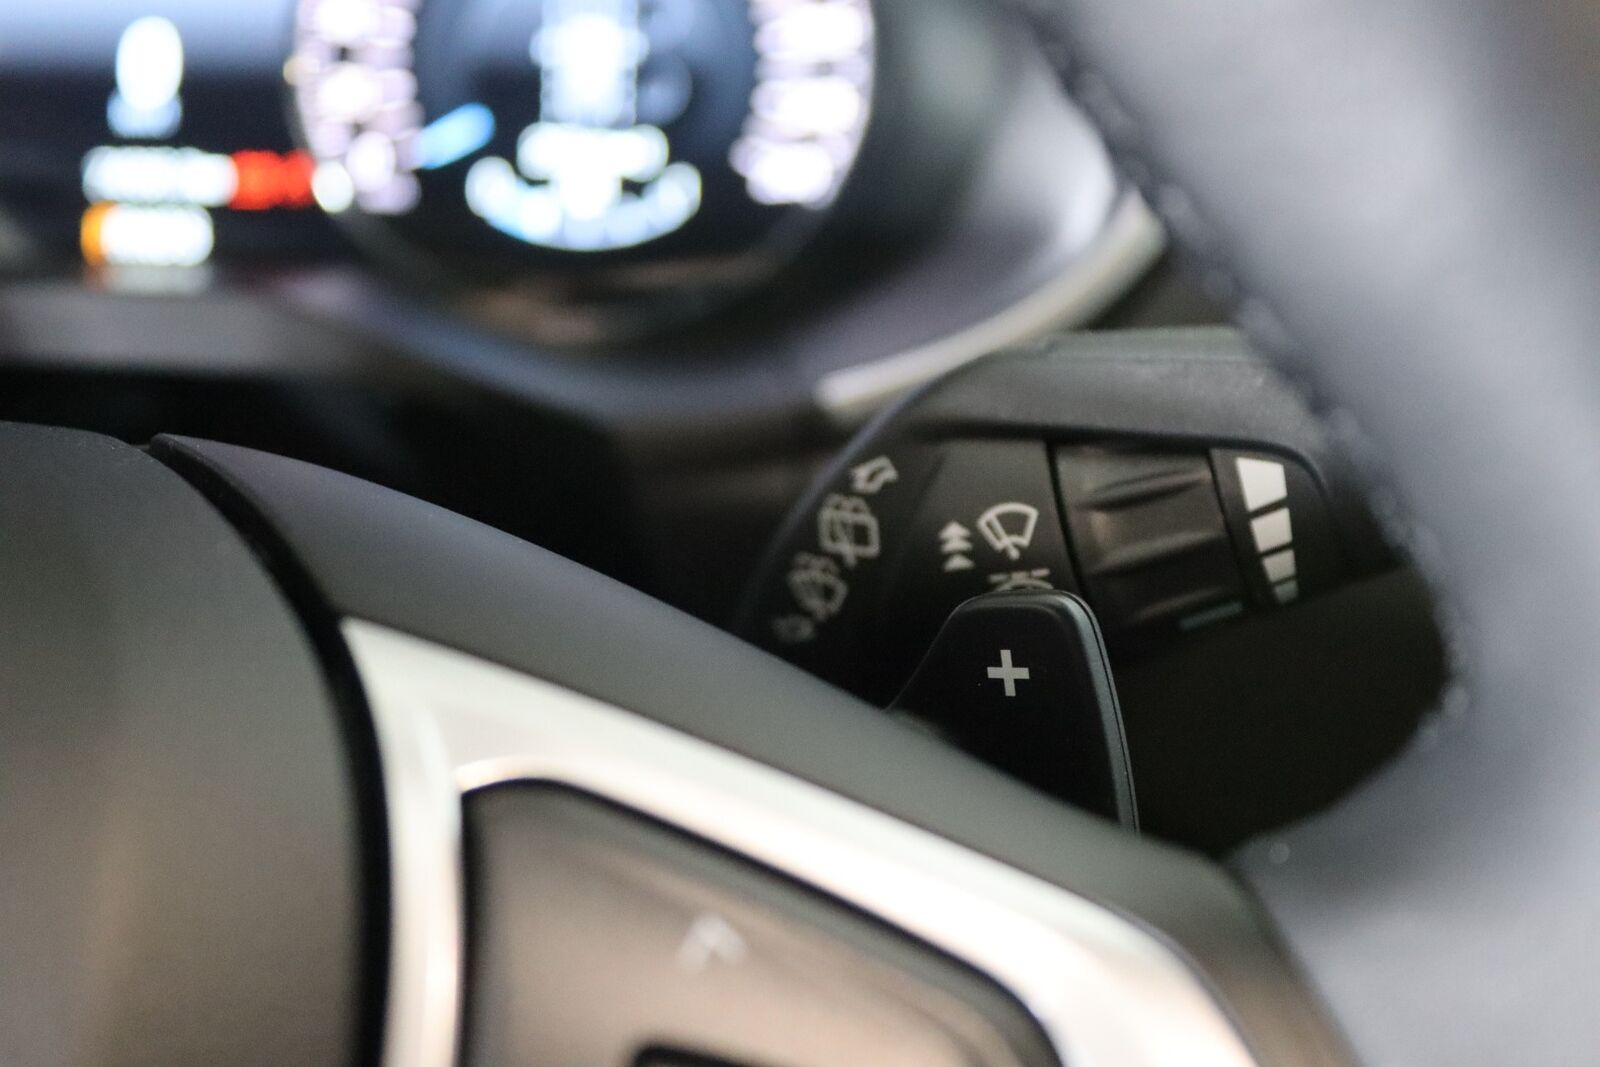 Ford S-MAX 2,0 TDCi 150 Titanium aut. 7prs - billede 12